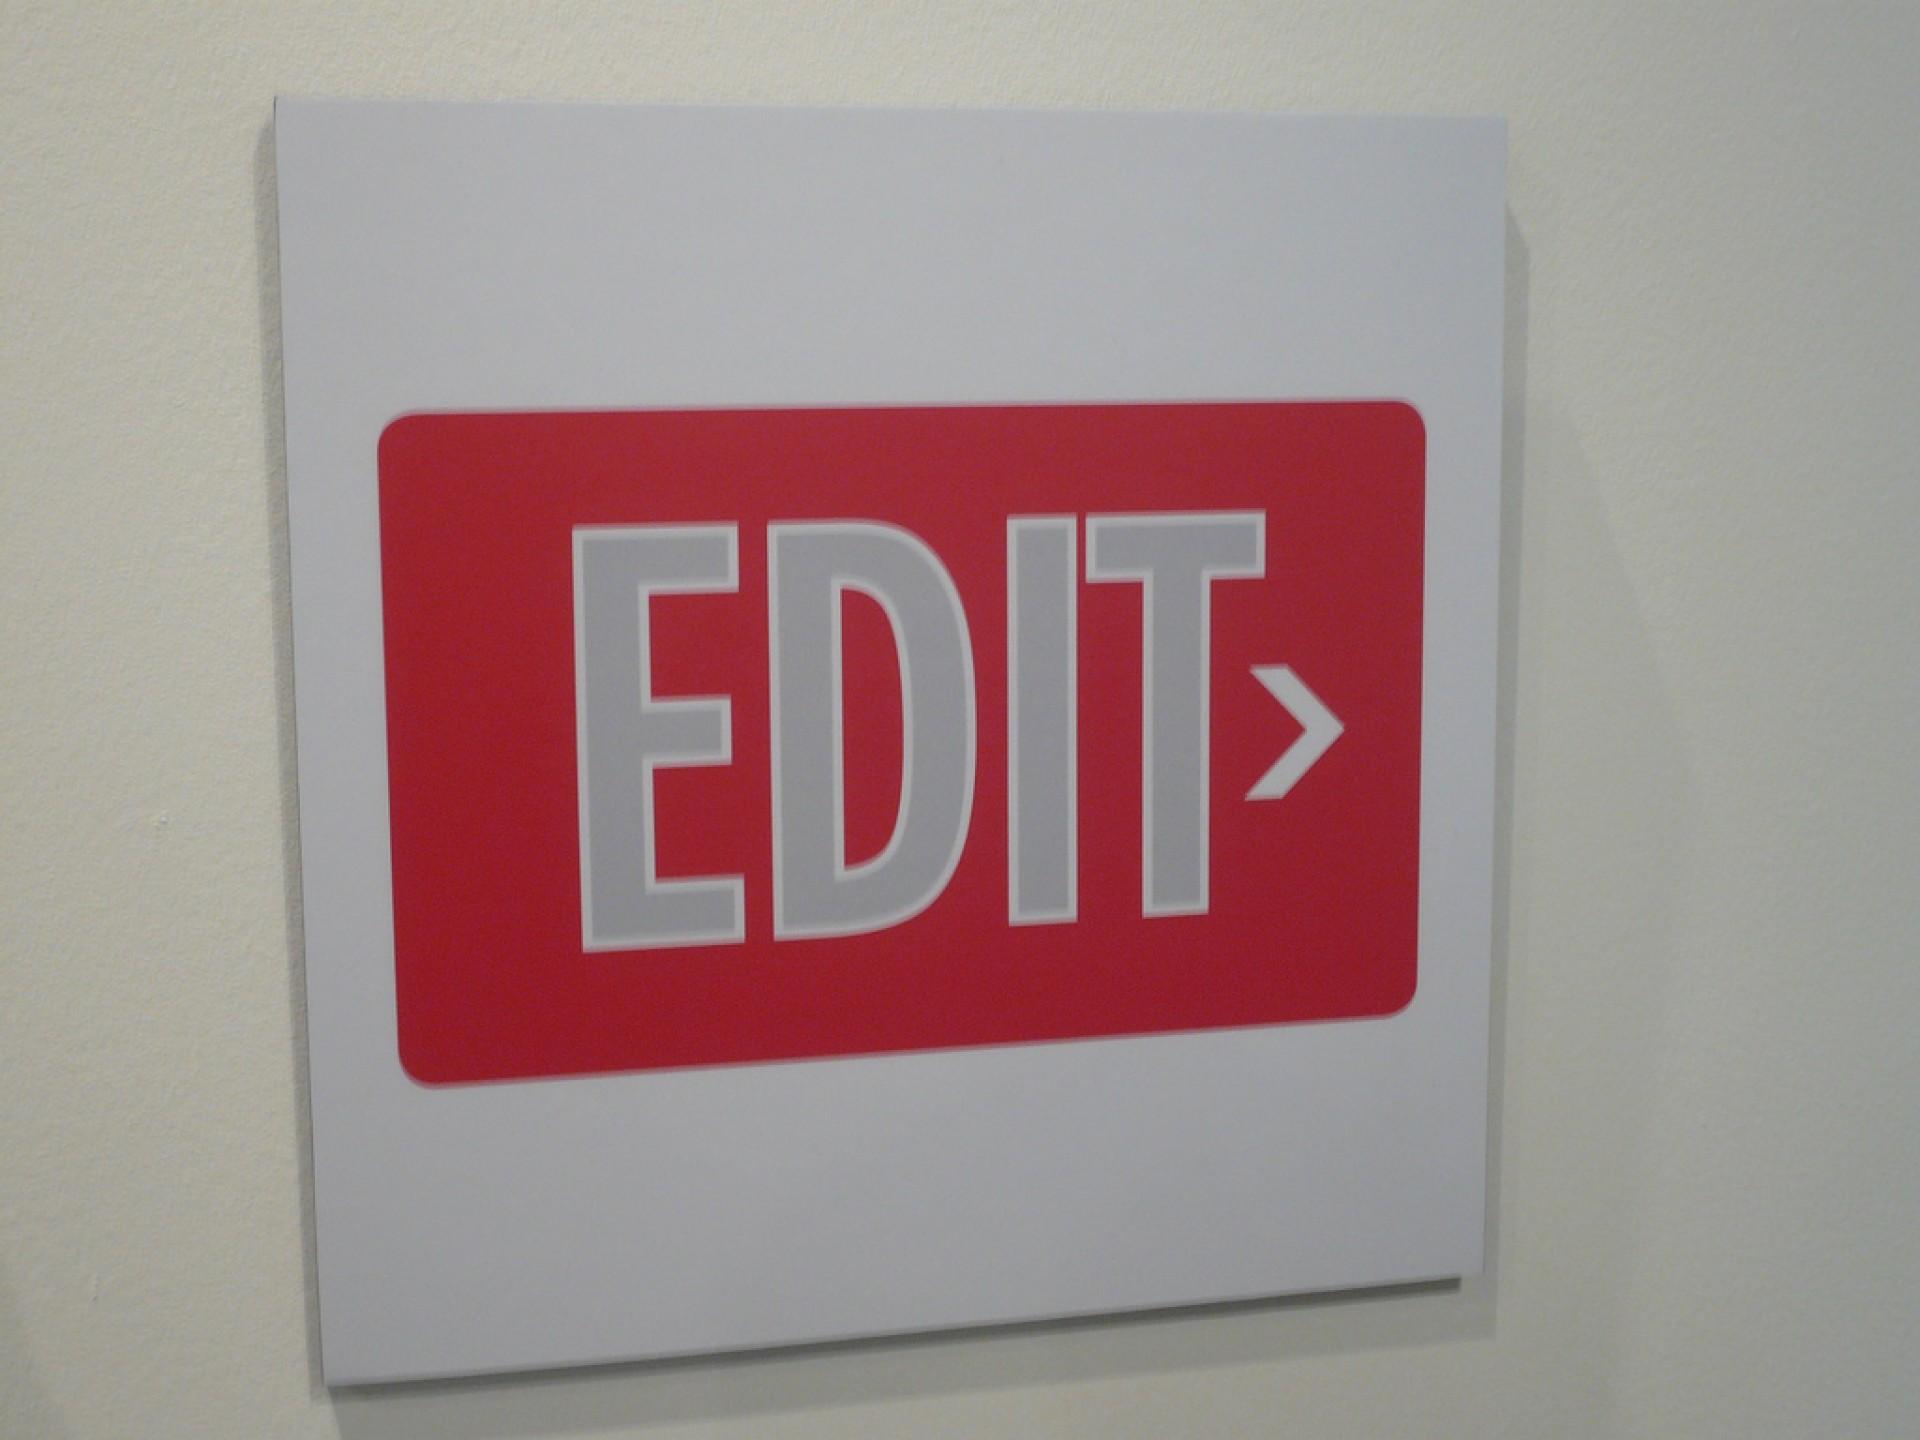 018 Edit Essay Example College Word Impressive Limit Count Admission 2019 1920